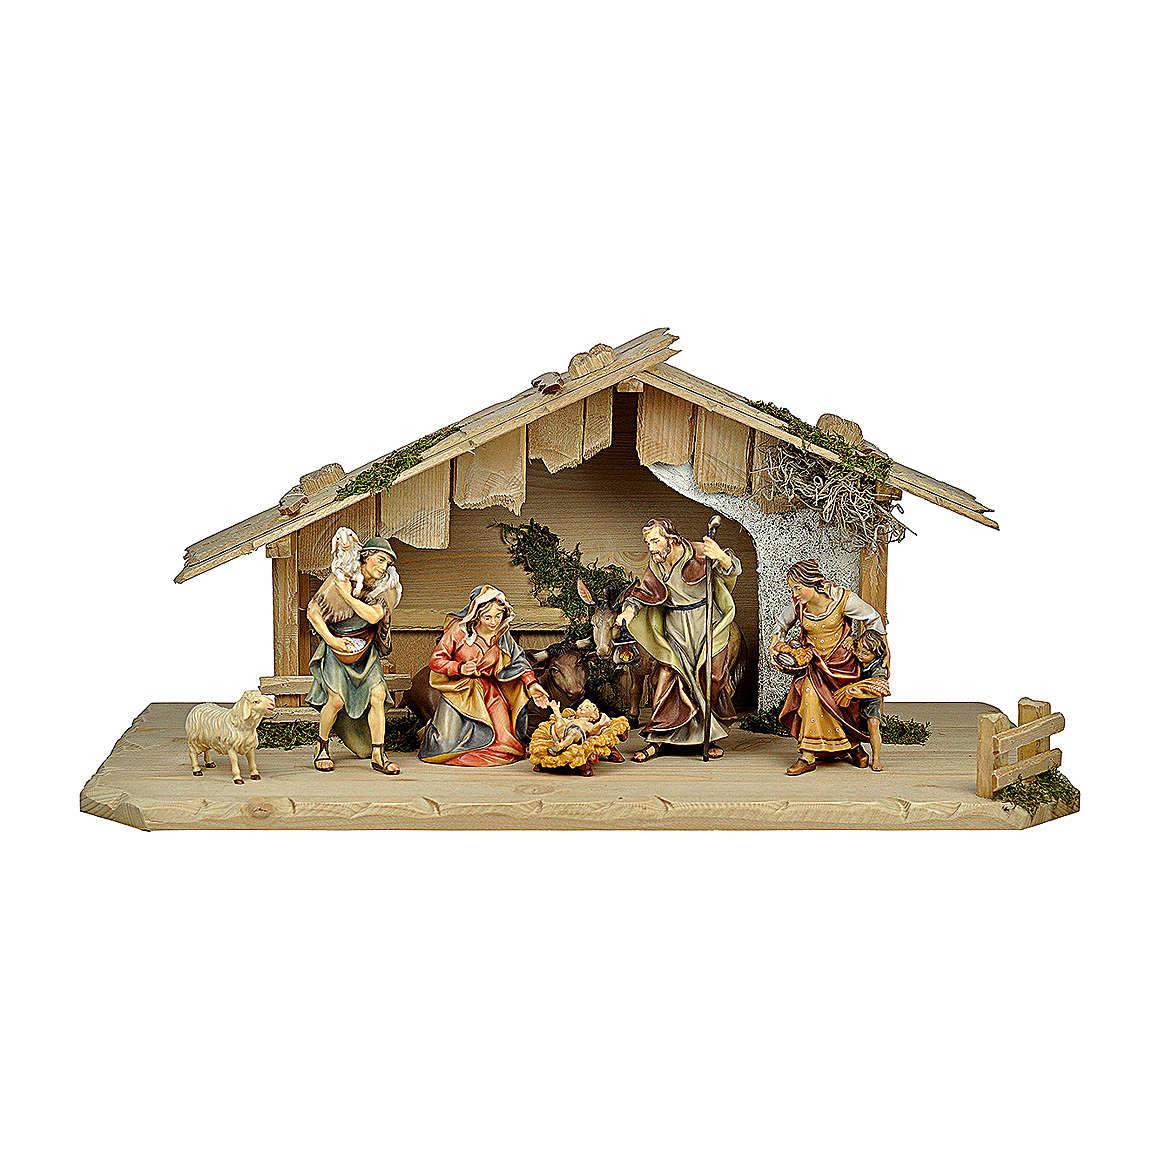 Presepe pastori, bue e asino mod. Original legno dipinto in Valgardena 10 cm - 8 pz 4